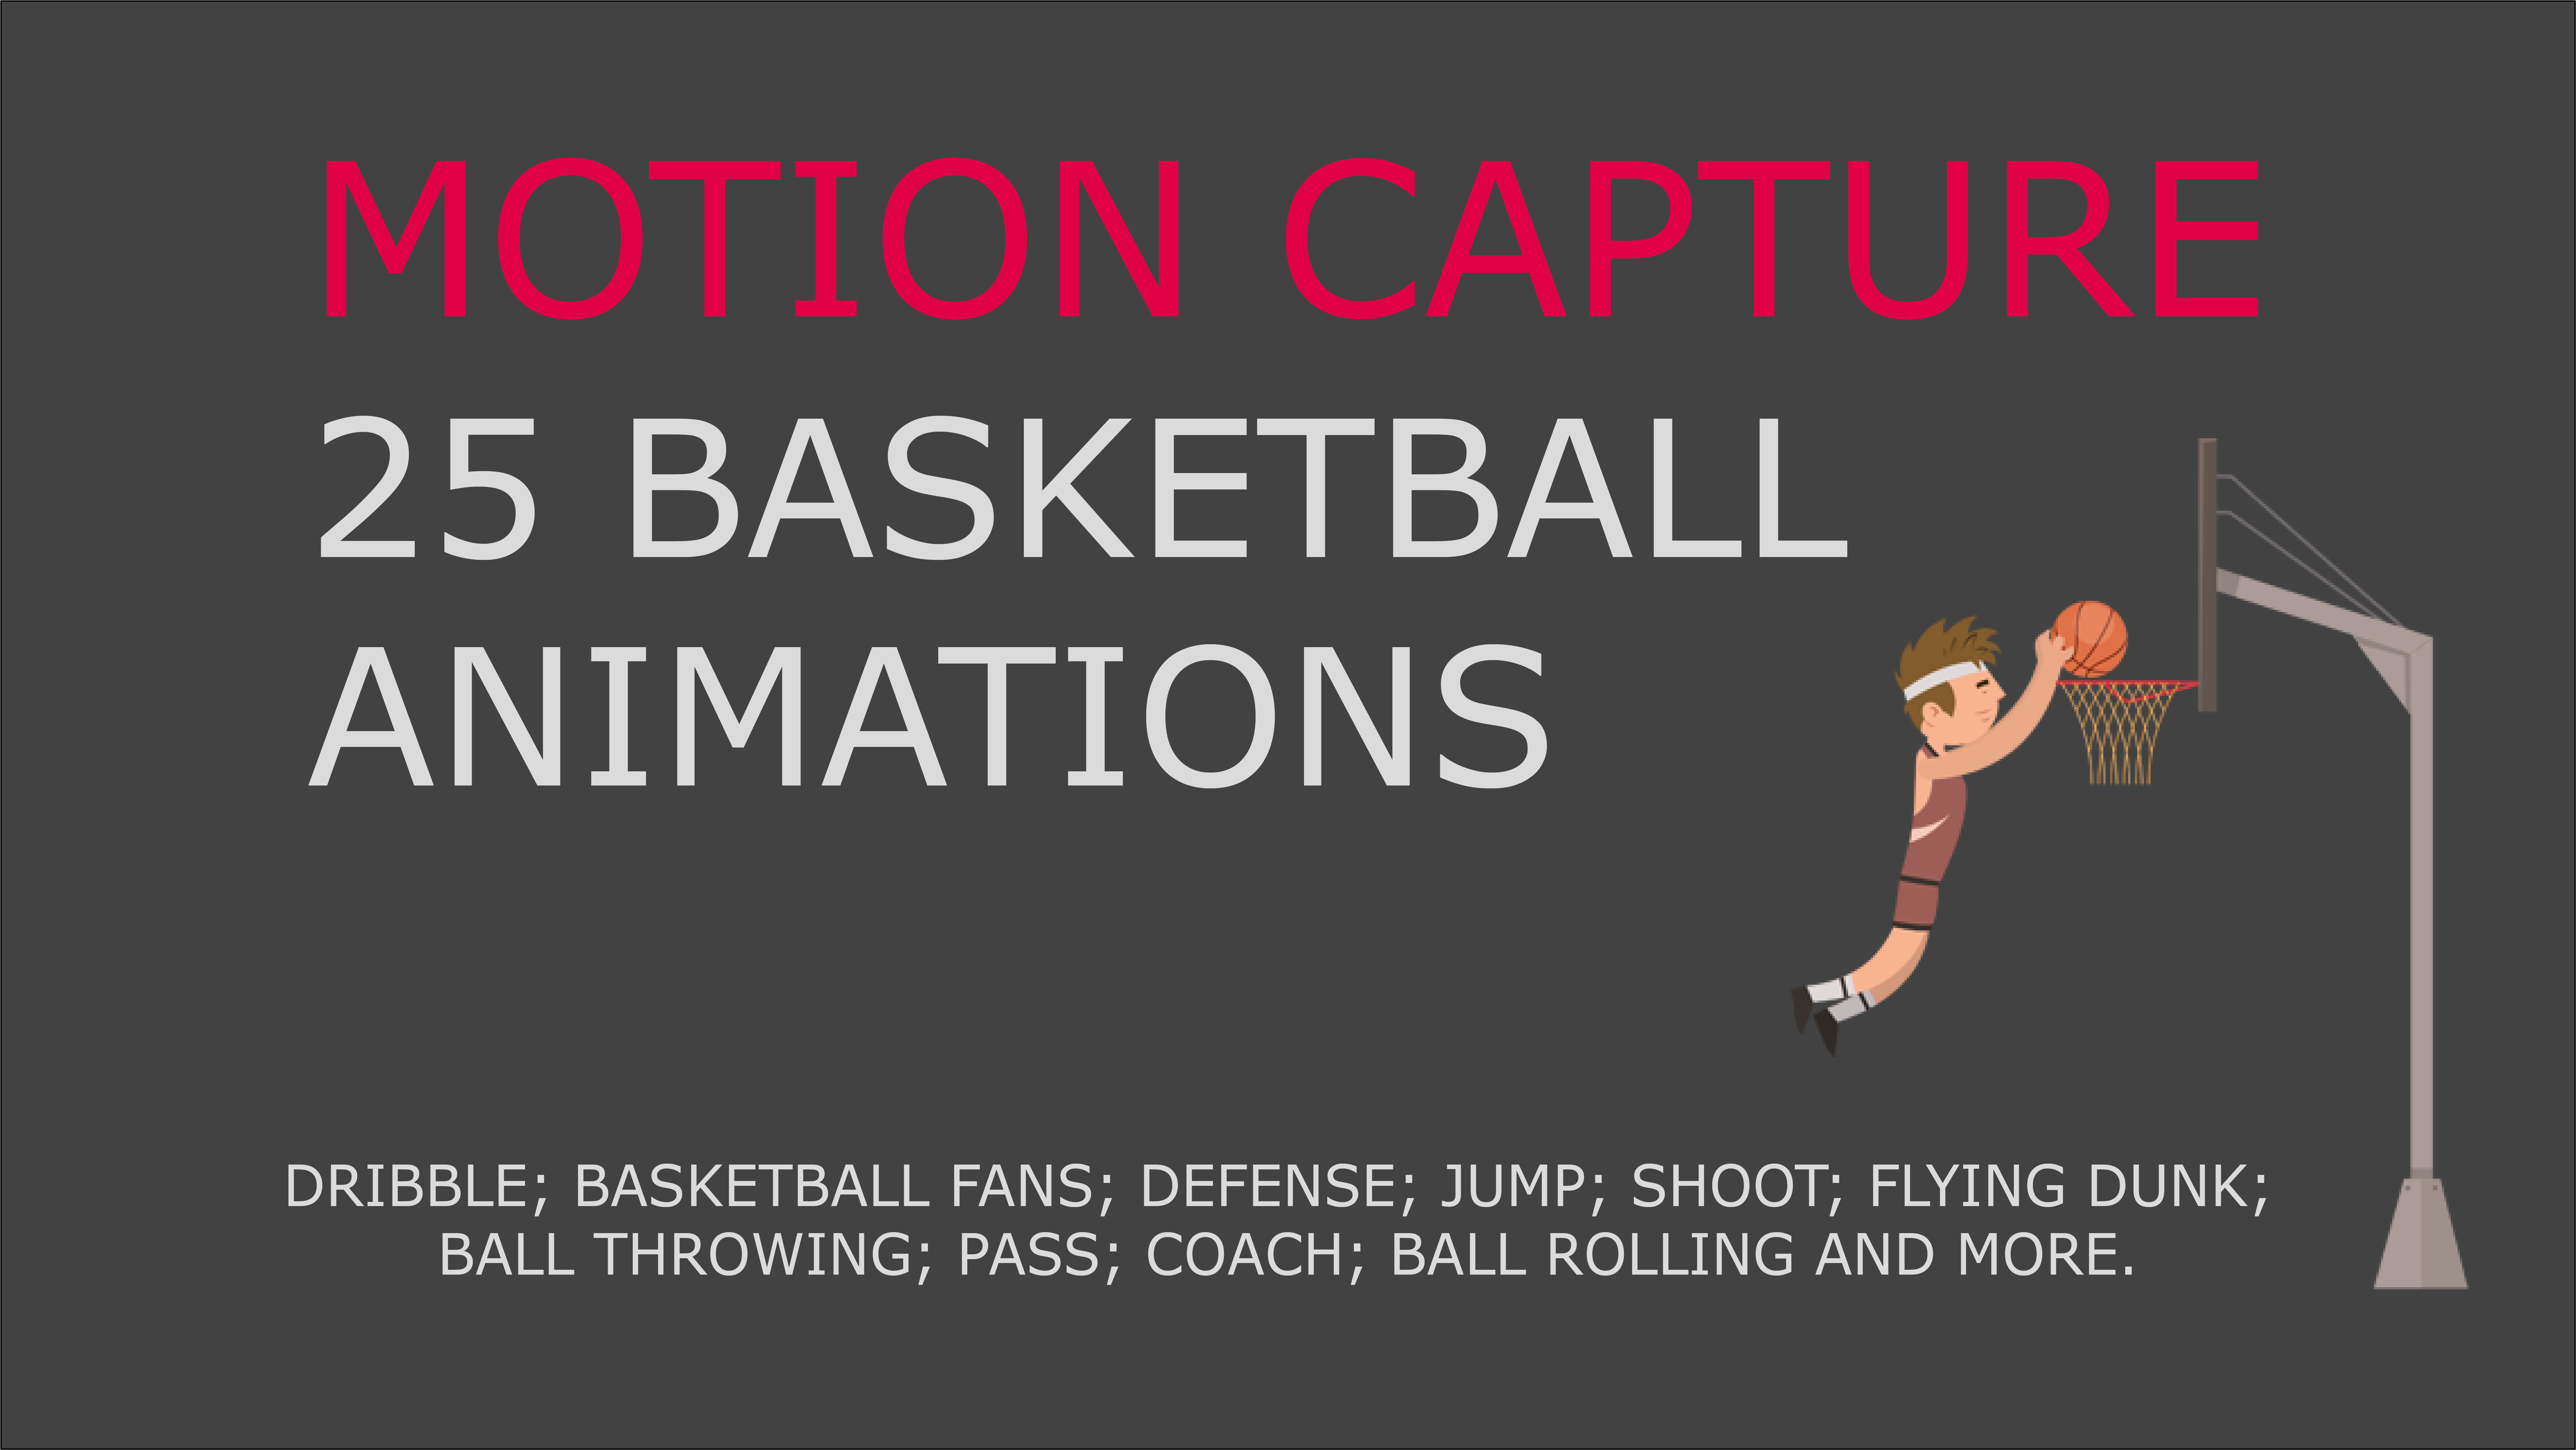 Basketball motion capture